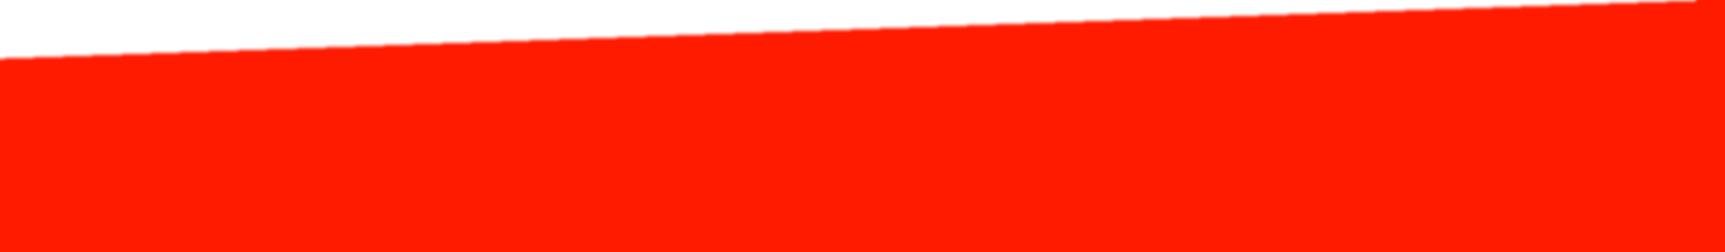 Banner bottom.png